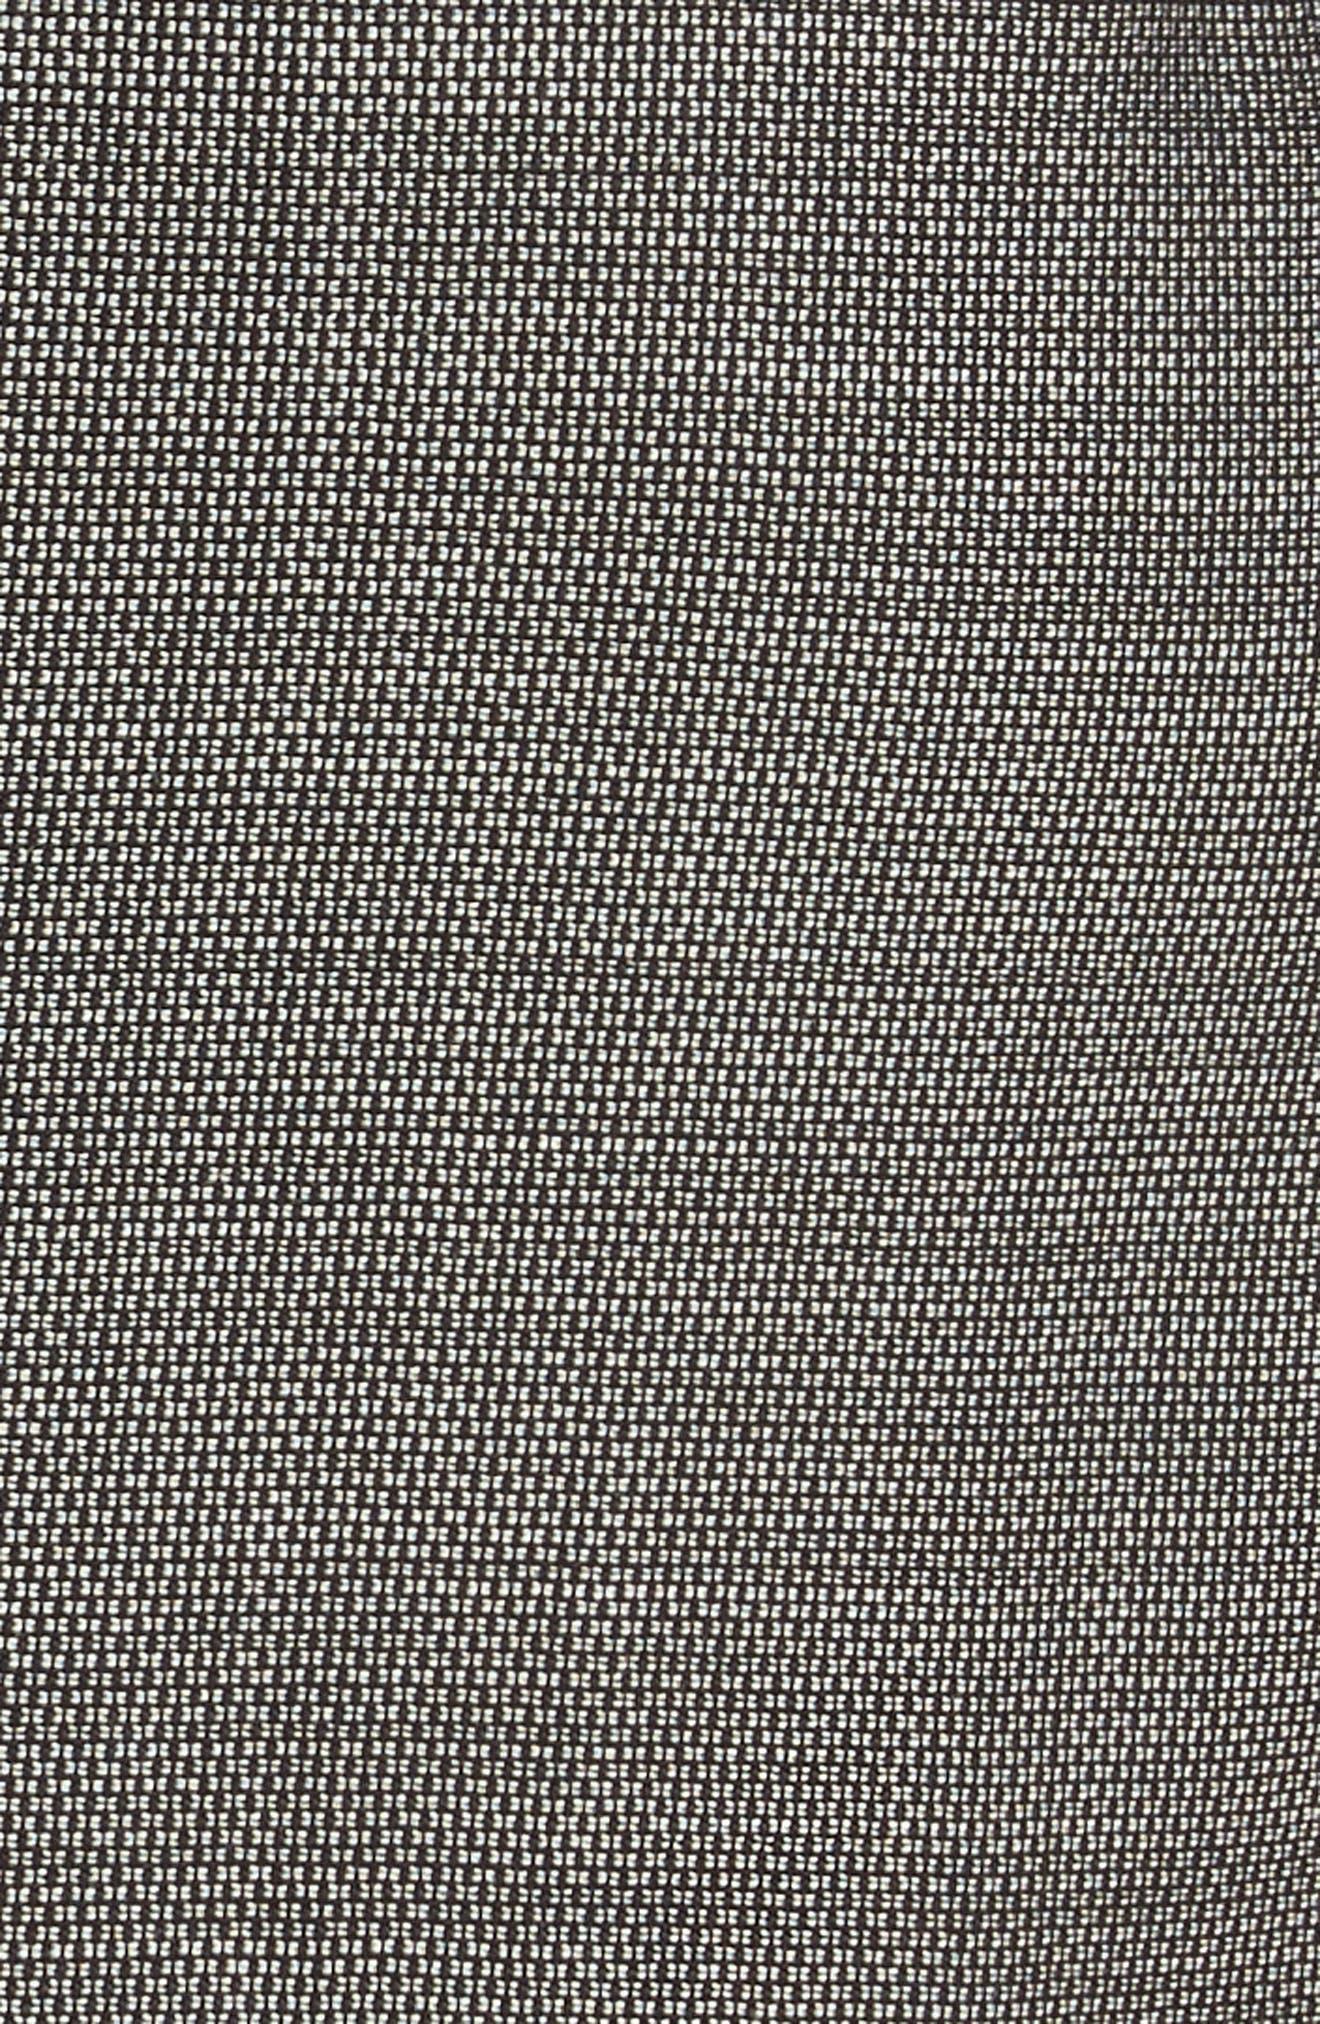 Canapa Stretch Wool Layered Sheath Dress,                             Alternate thumbnail 5, color,                             001